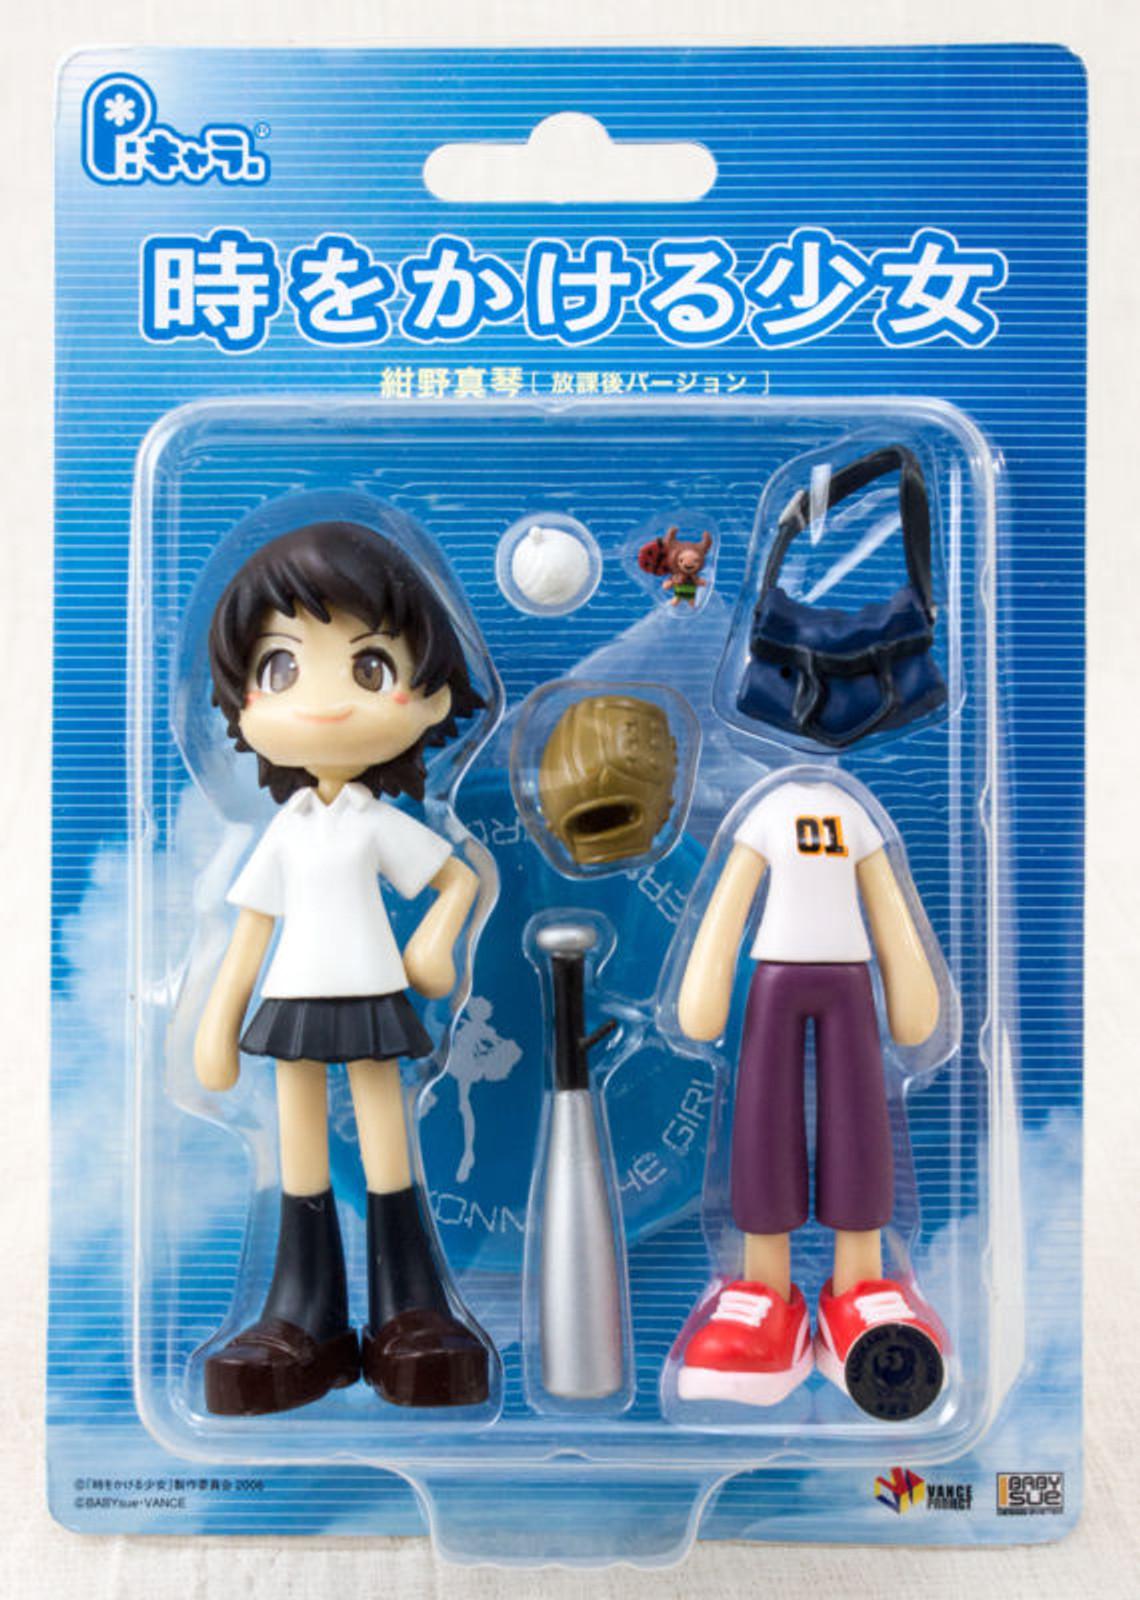 The Girl who Leapt Through Time P:Chara Makoto Konno Figure JAPAN ANIME MANGA